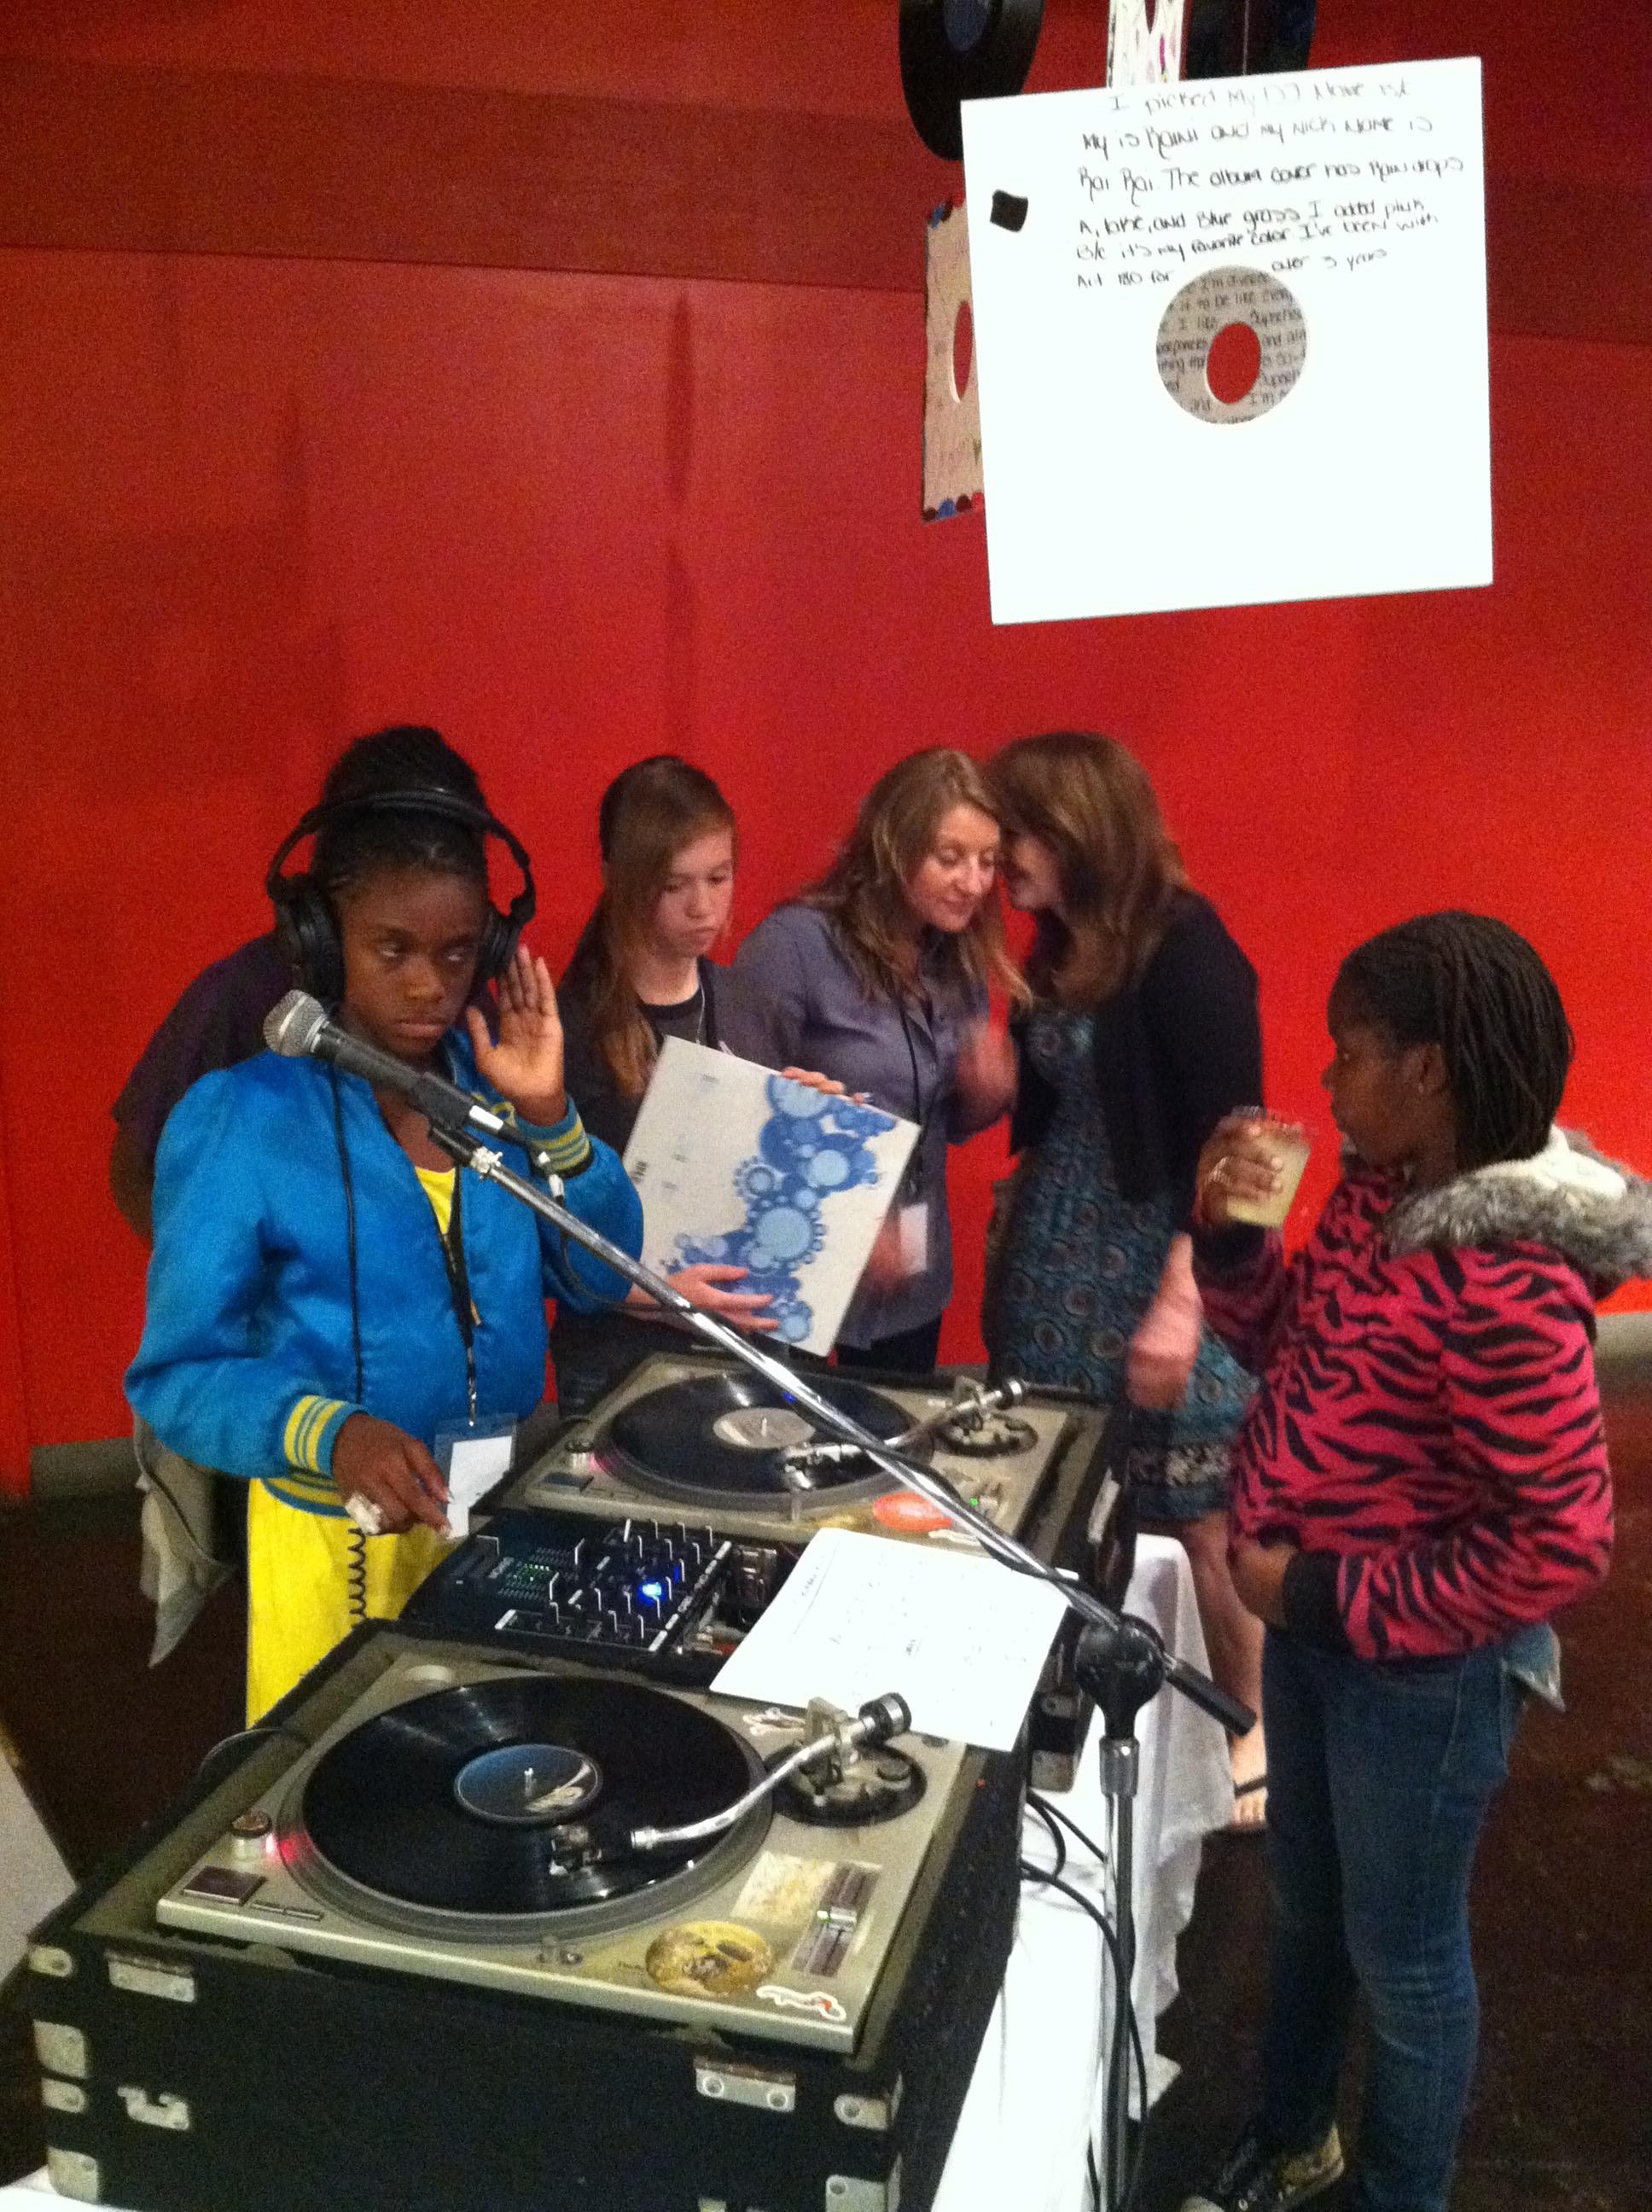 Participants in the DJ and Vinyl Appreciation Class providing the soundtrack for The Big Show (2010)